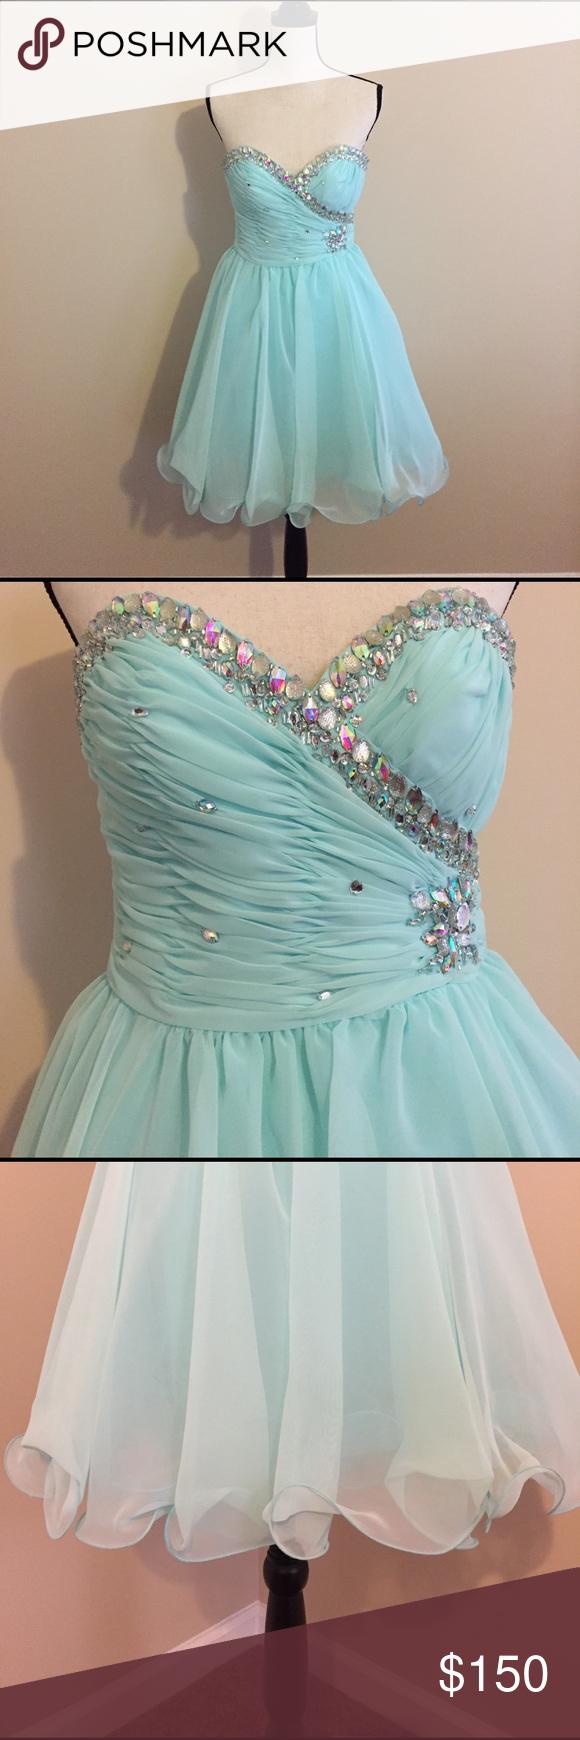 Home coming dress sz prom dress homecoming dress beautiful mori